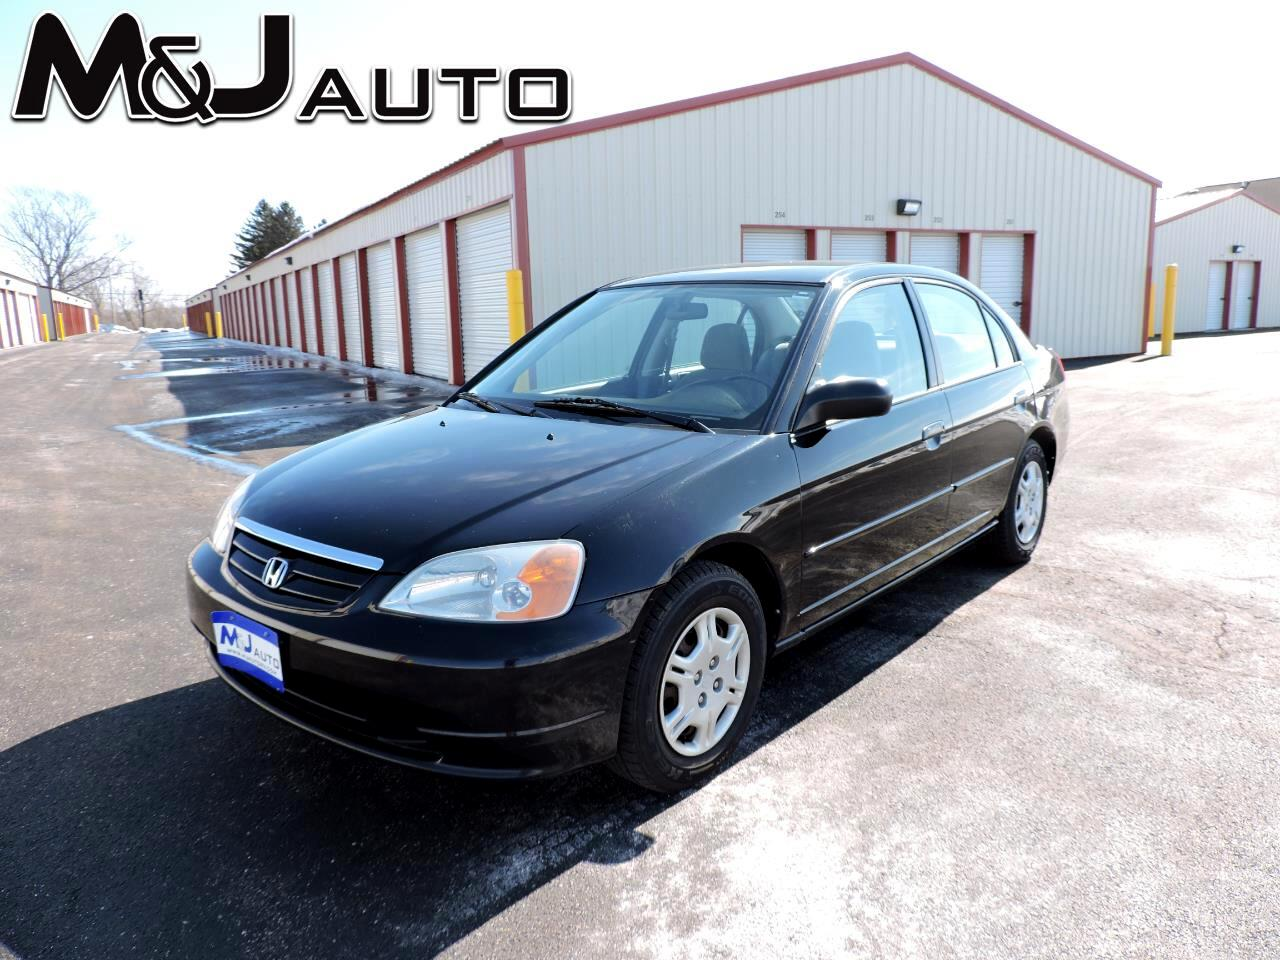 Honda Civic 4dr Sdn LX Auto 2001